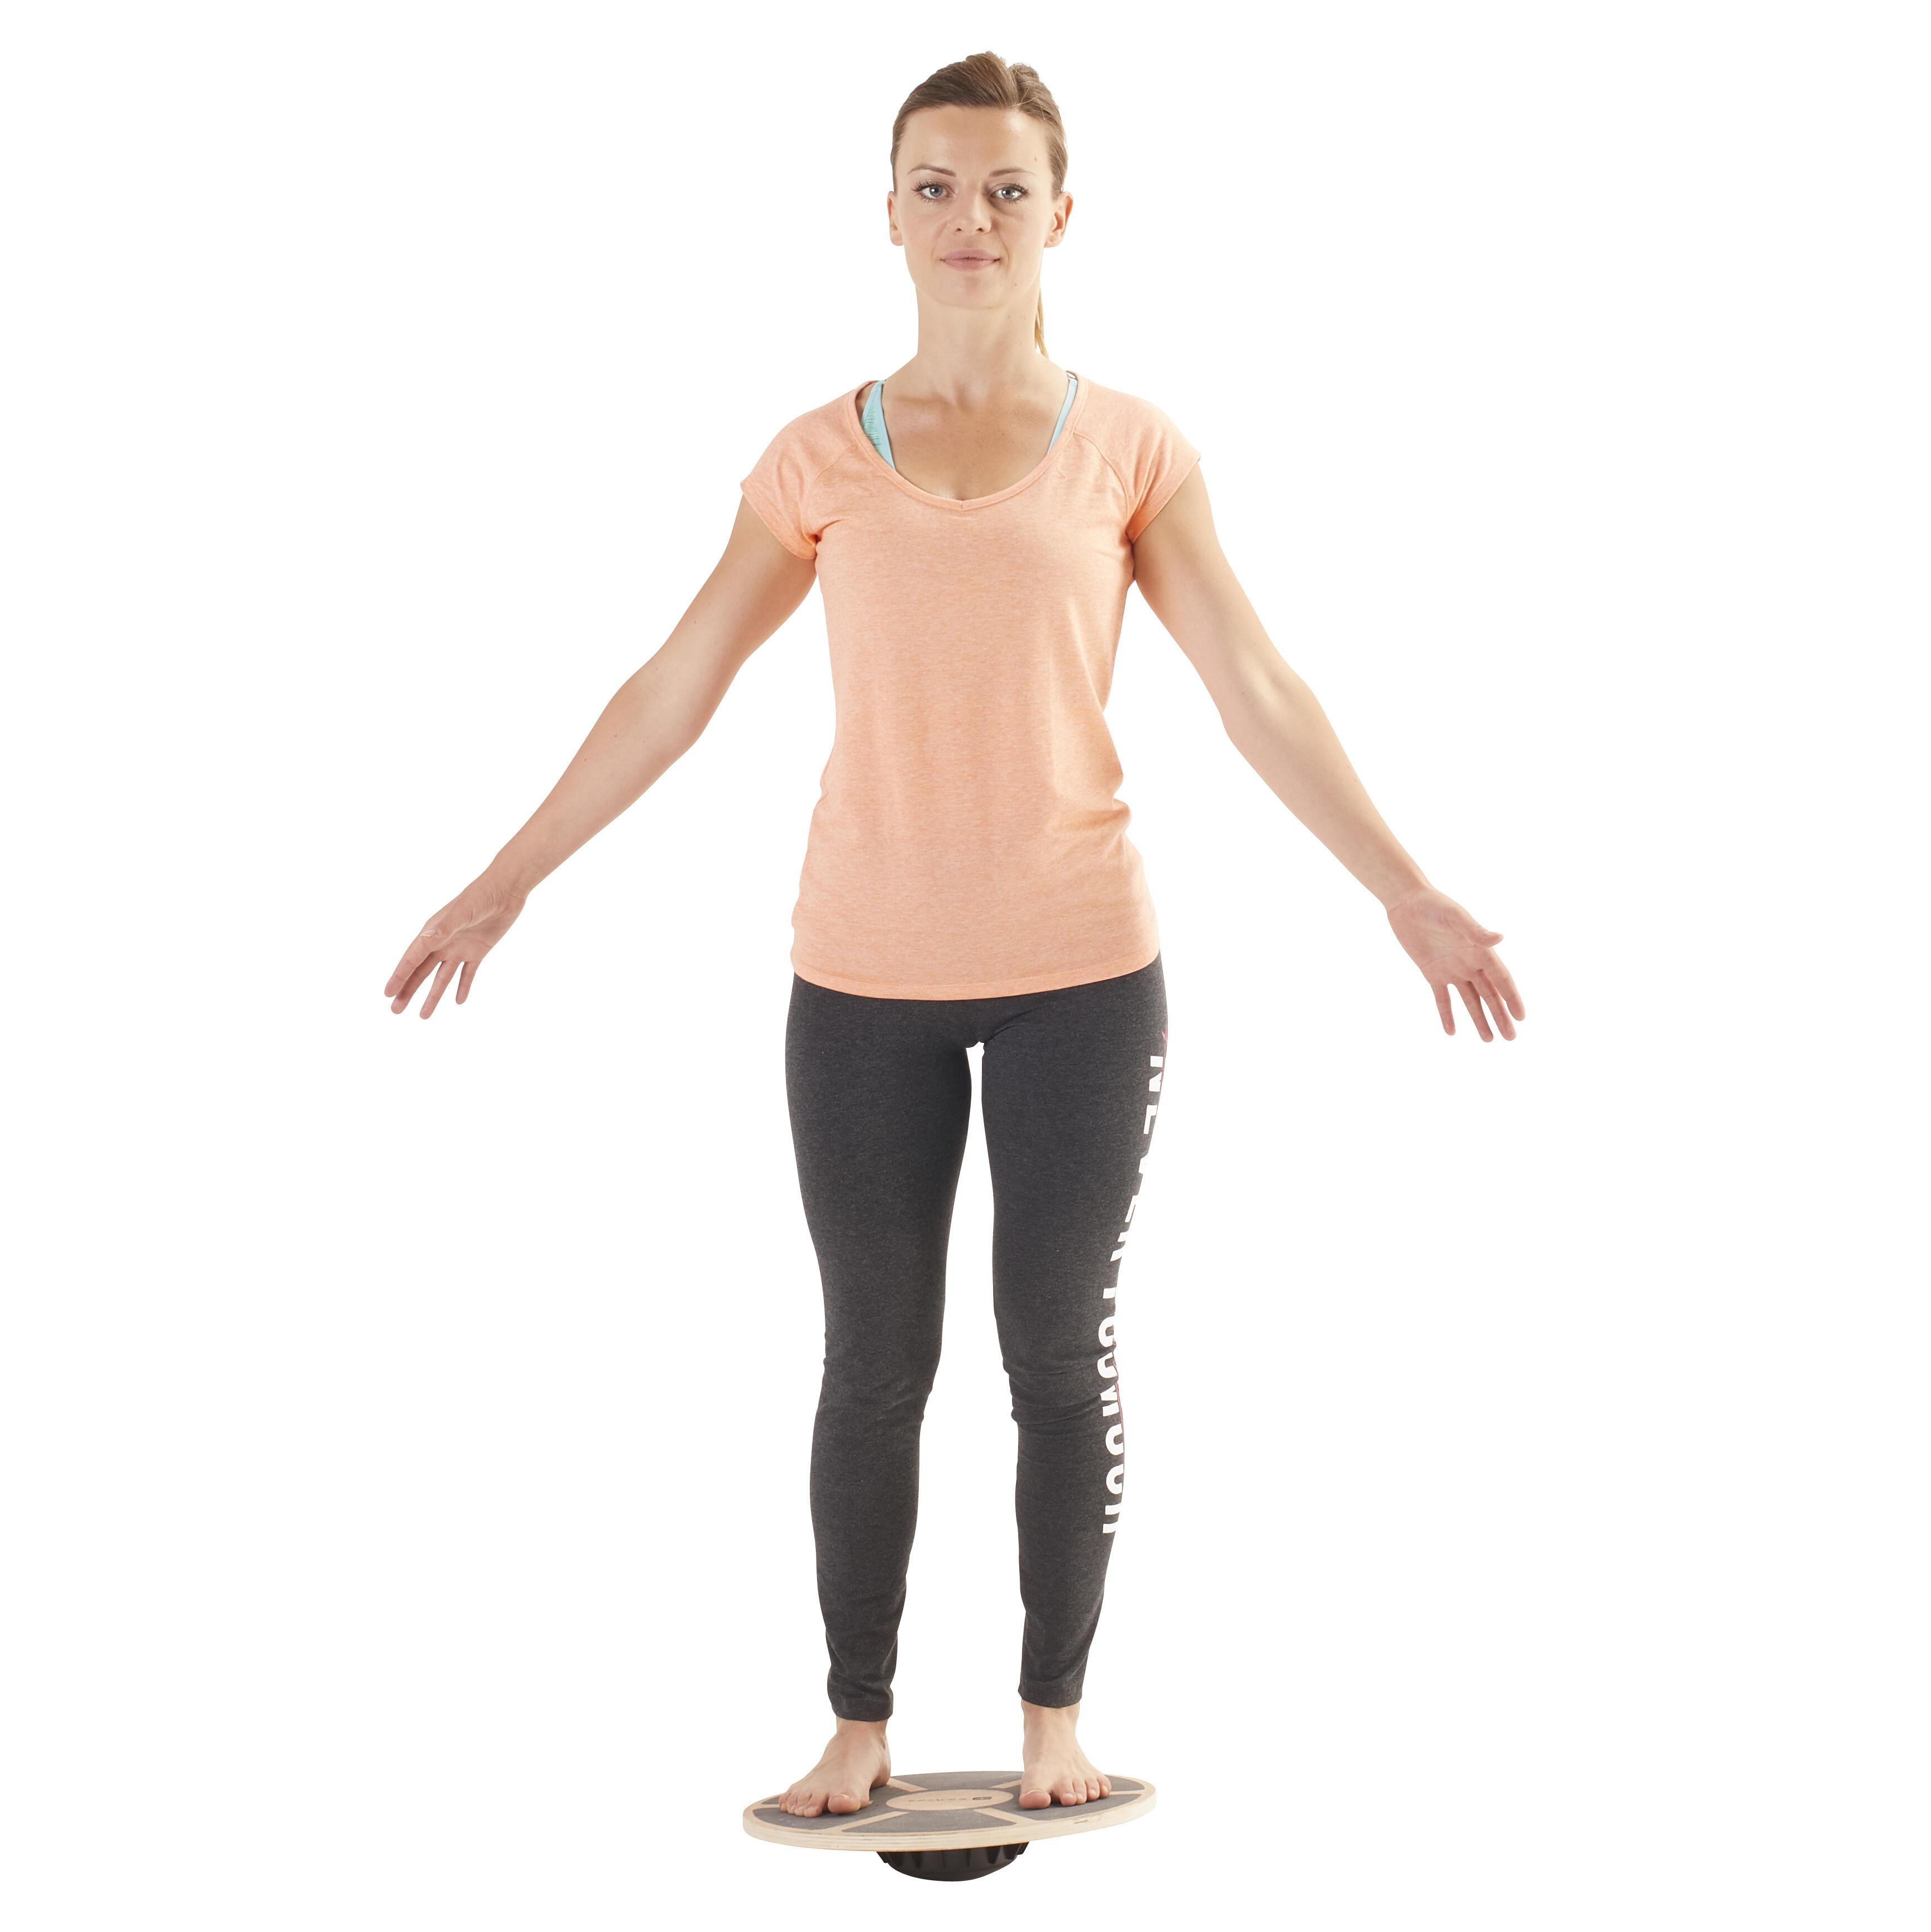 500 Pilates Stretching Balance Board